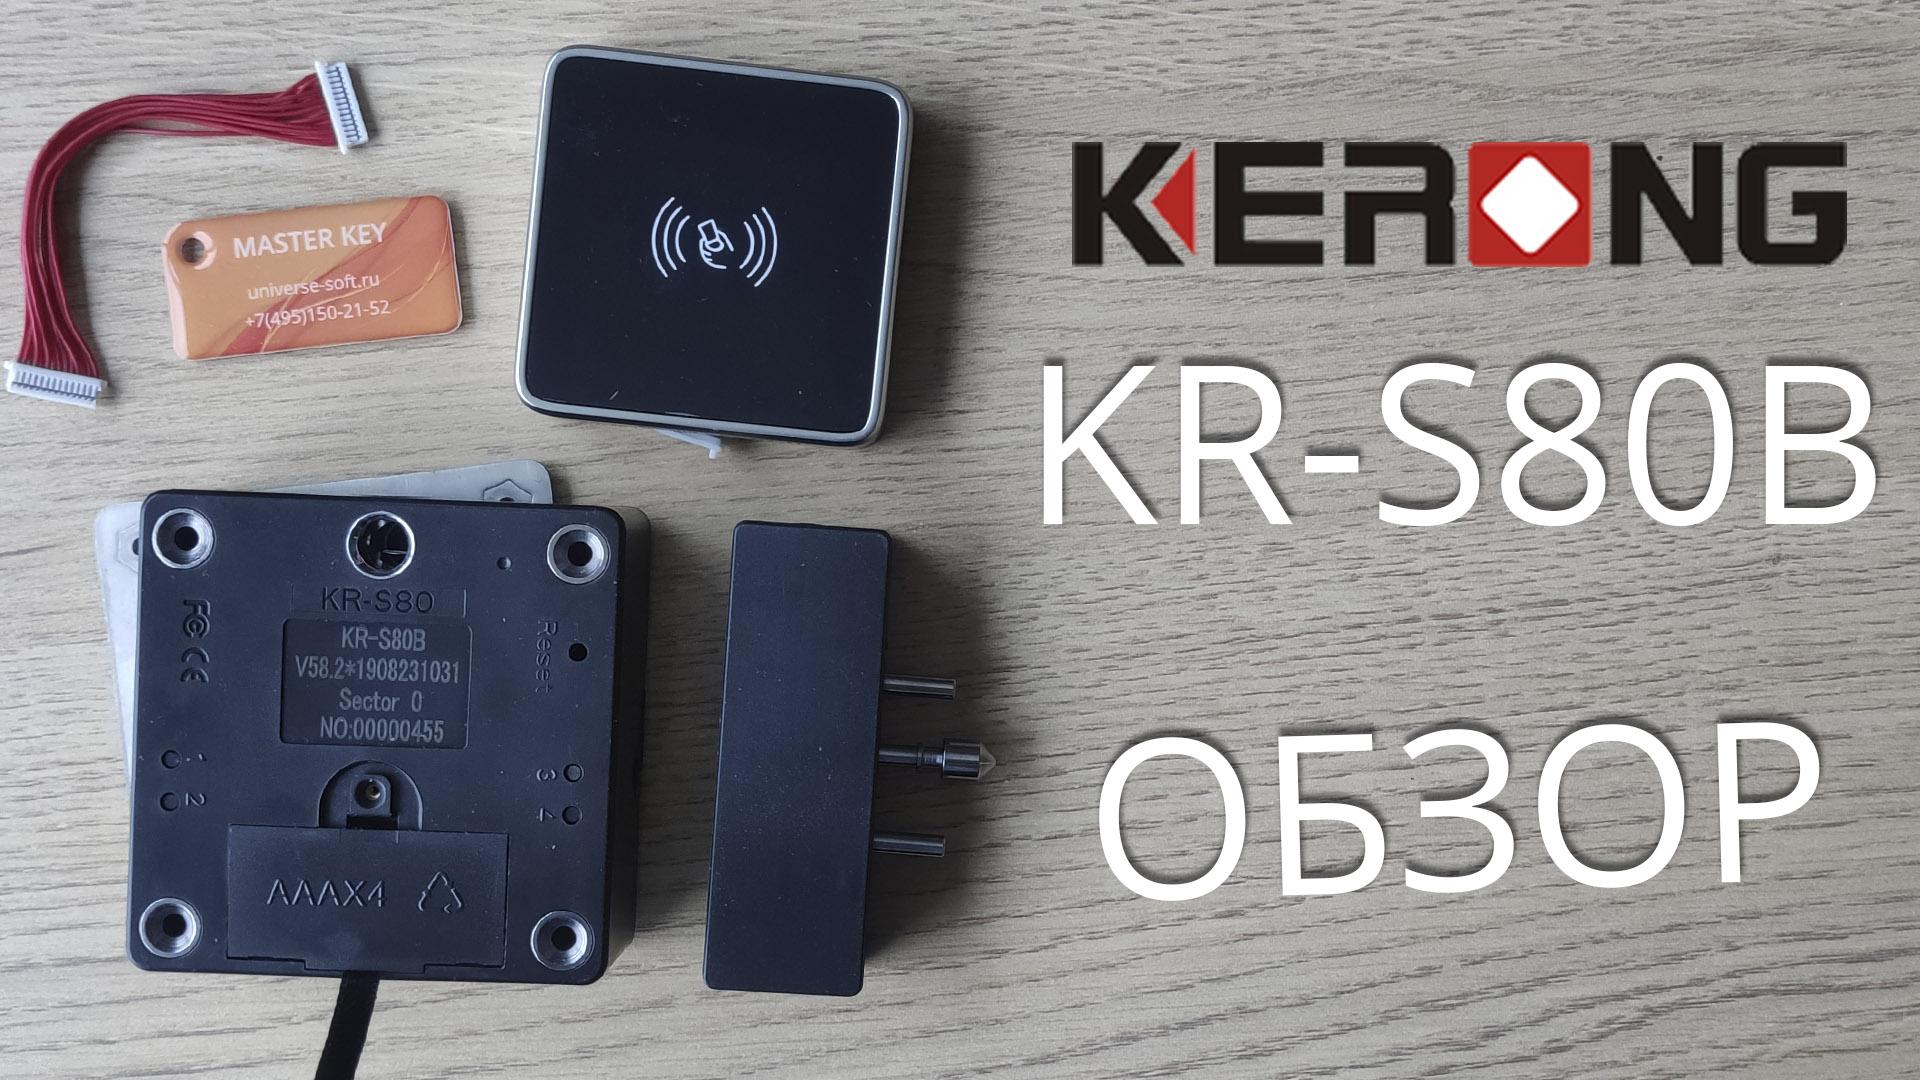 обзор kerong kr-s80b